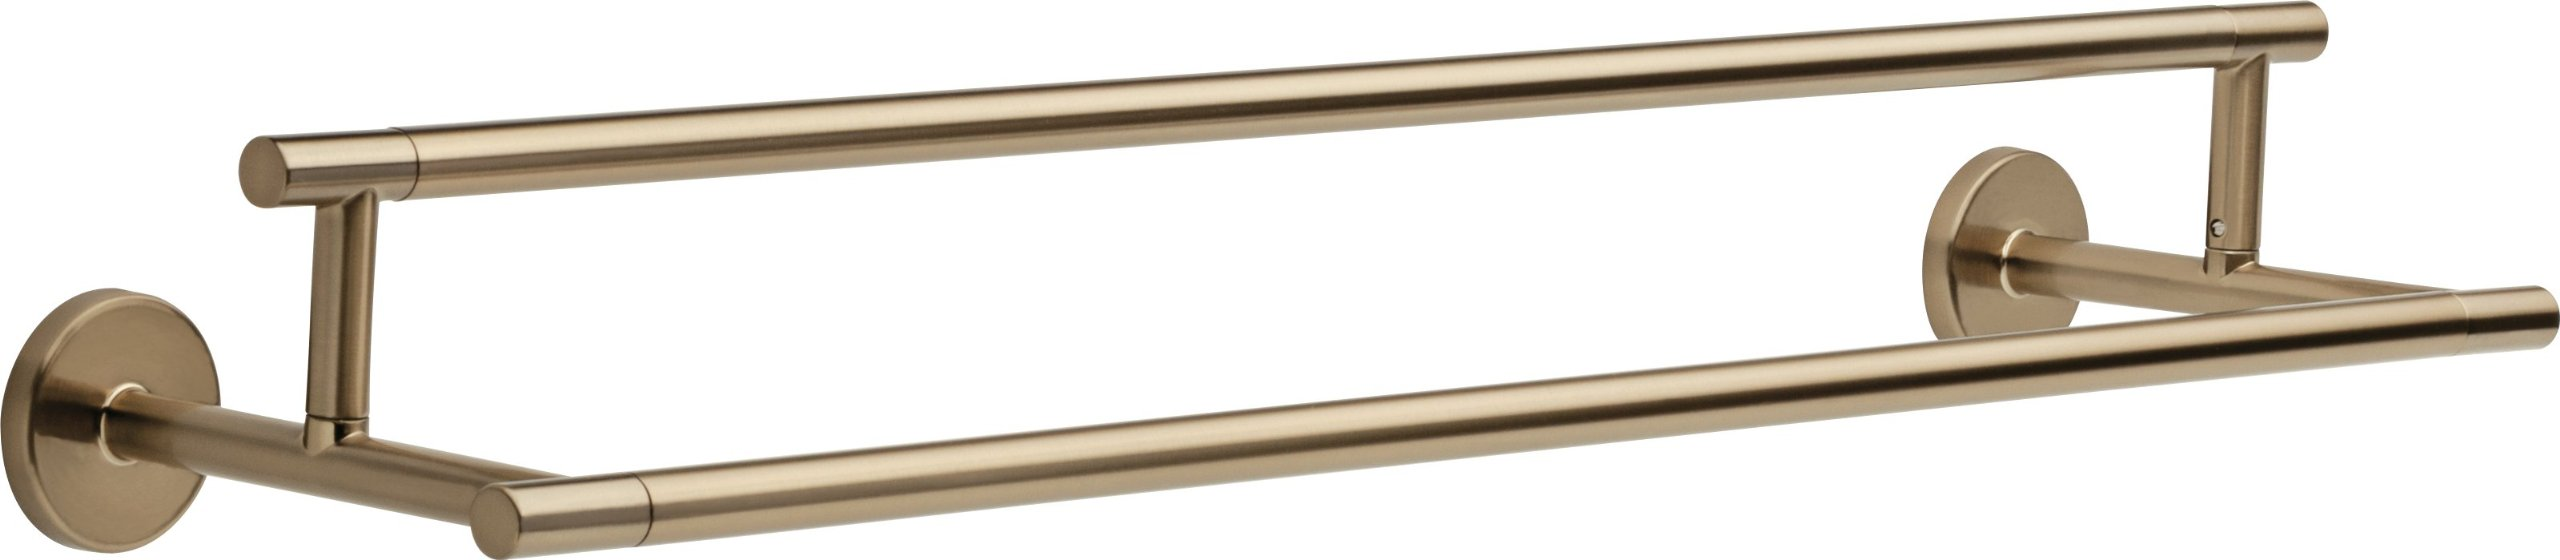 Delta Faucet 75925-CZ Trinsic 24inch Double Towel Bar Rack, Champagne Bronze by Delta (Image #1)